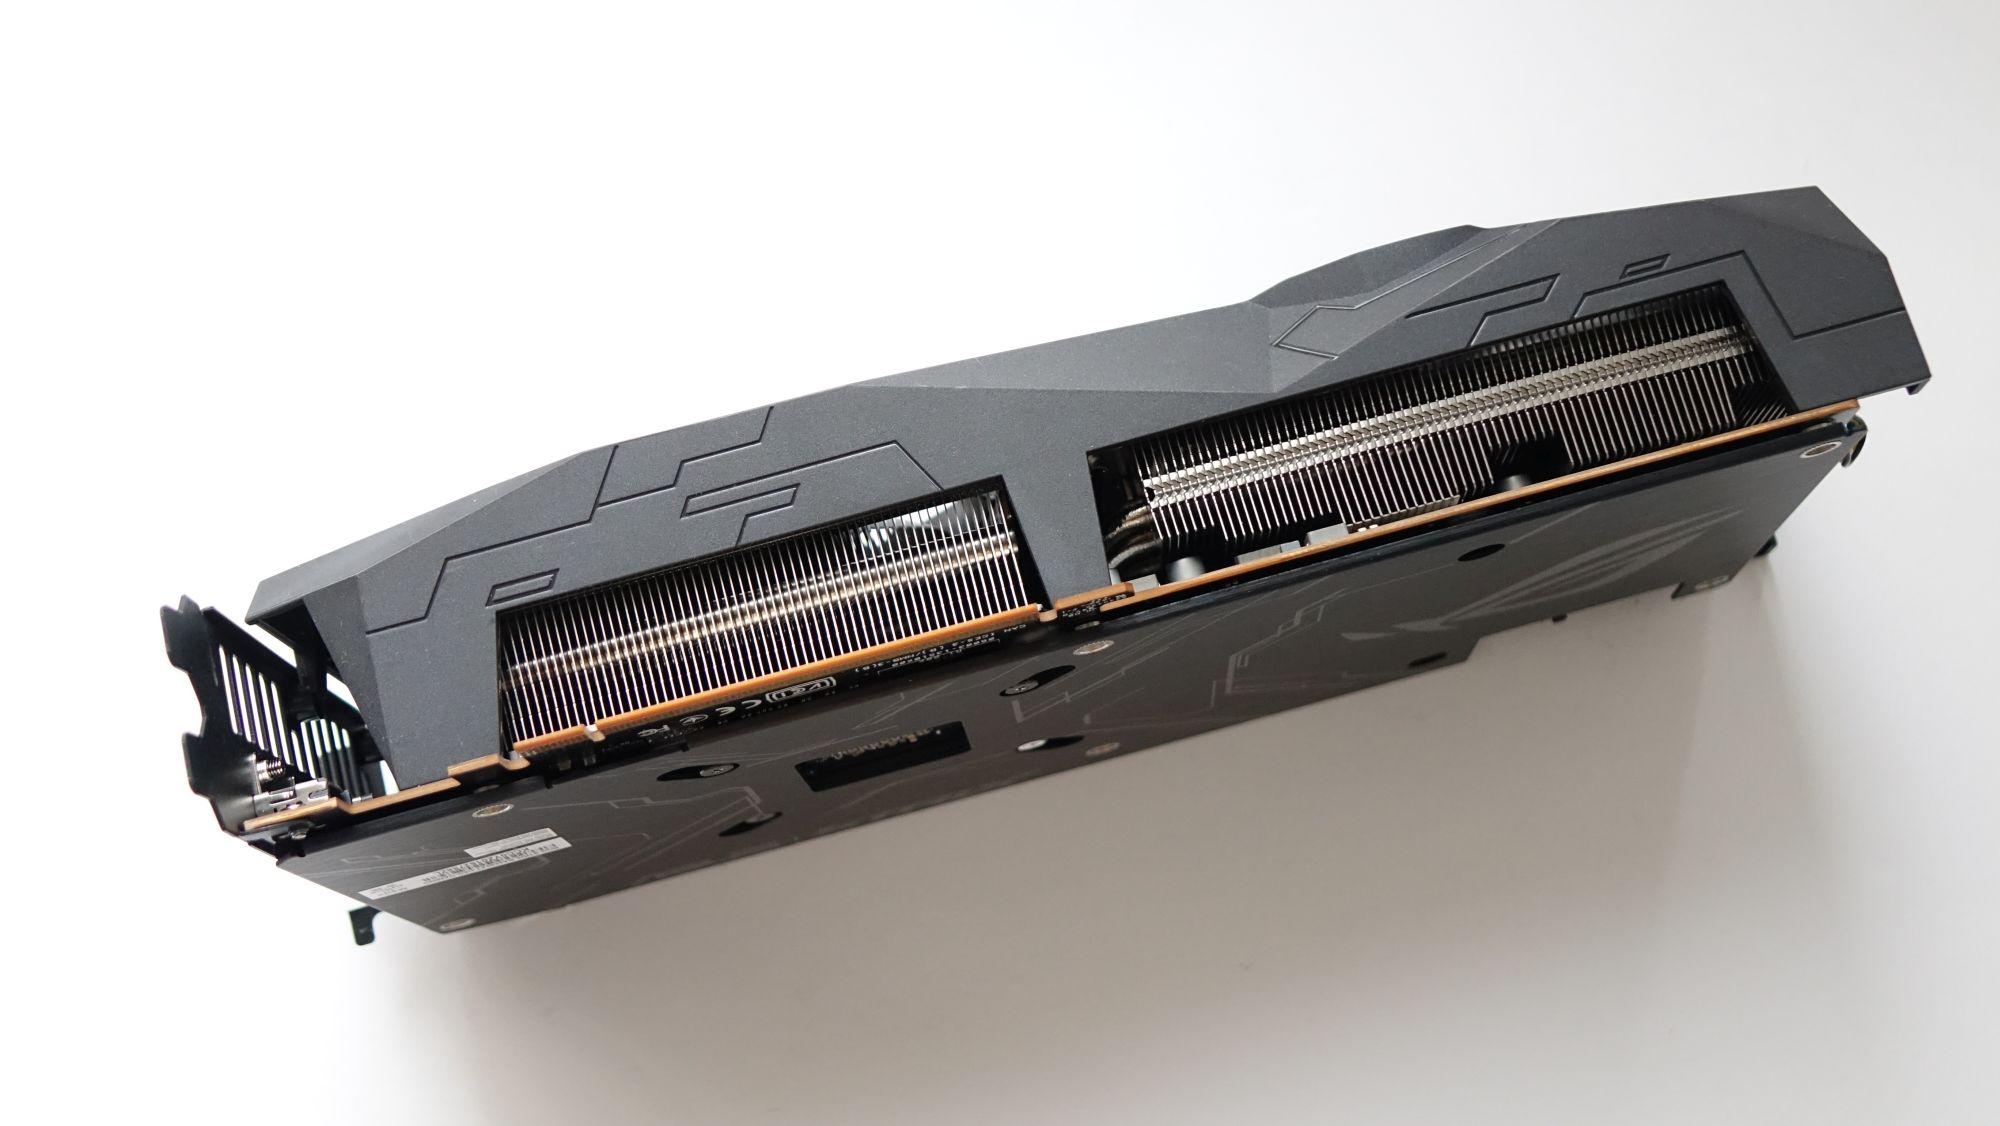 ASUS ROG Strix Radeon RX 5500 XT радиатор